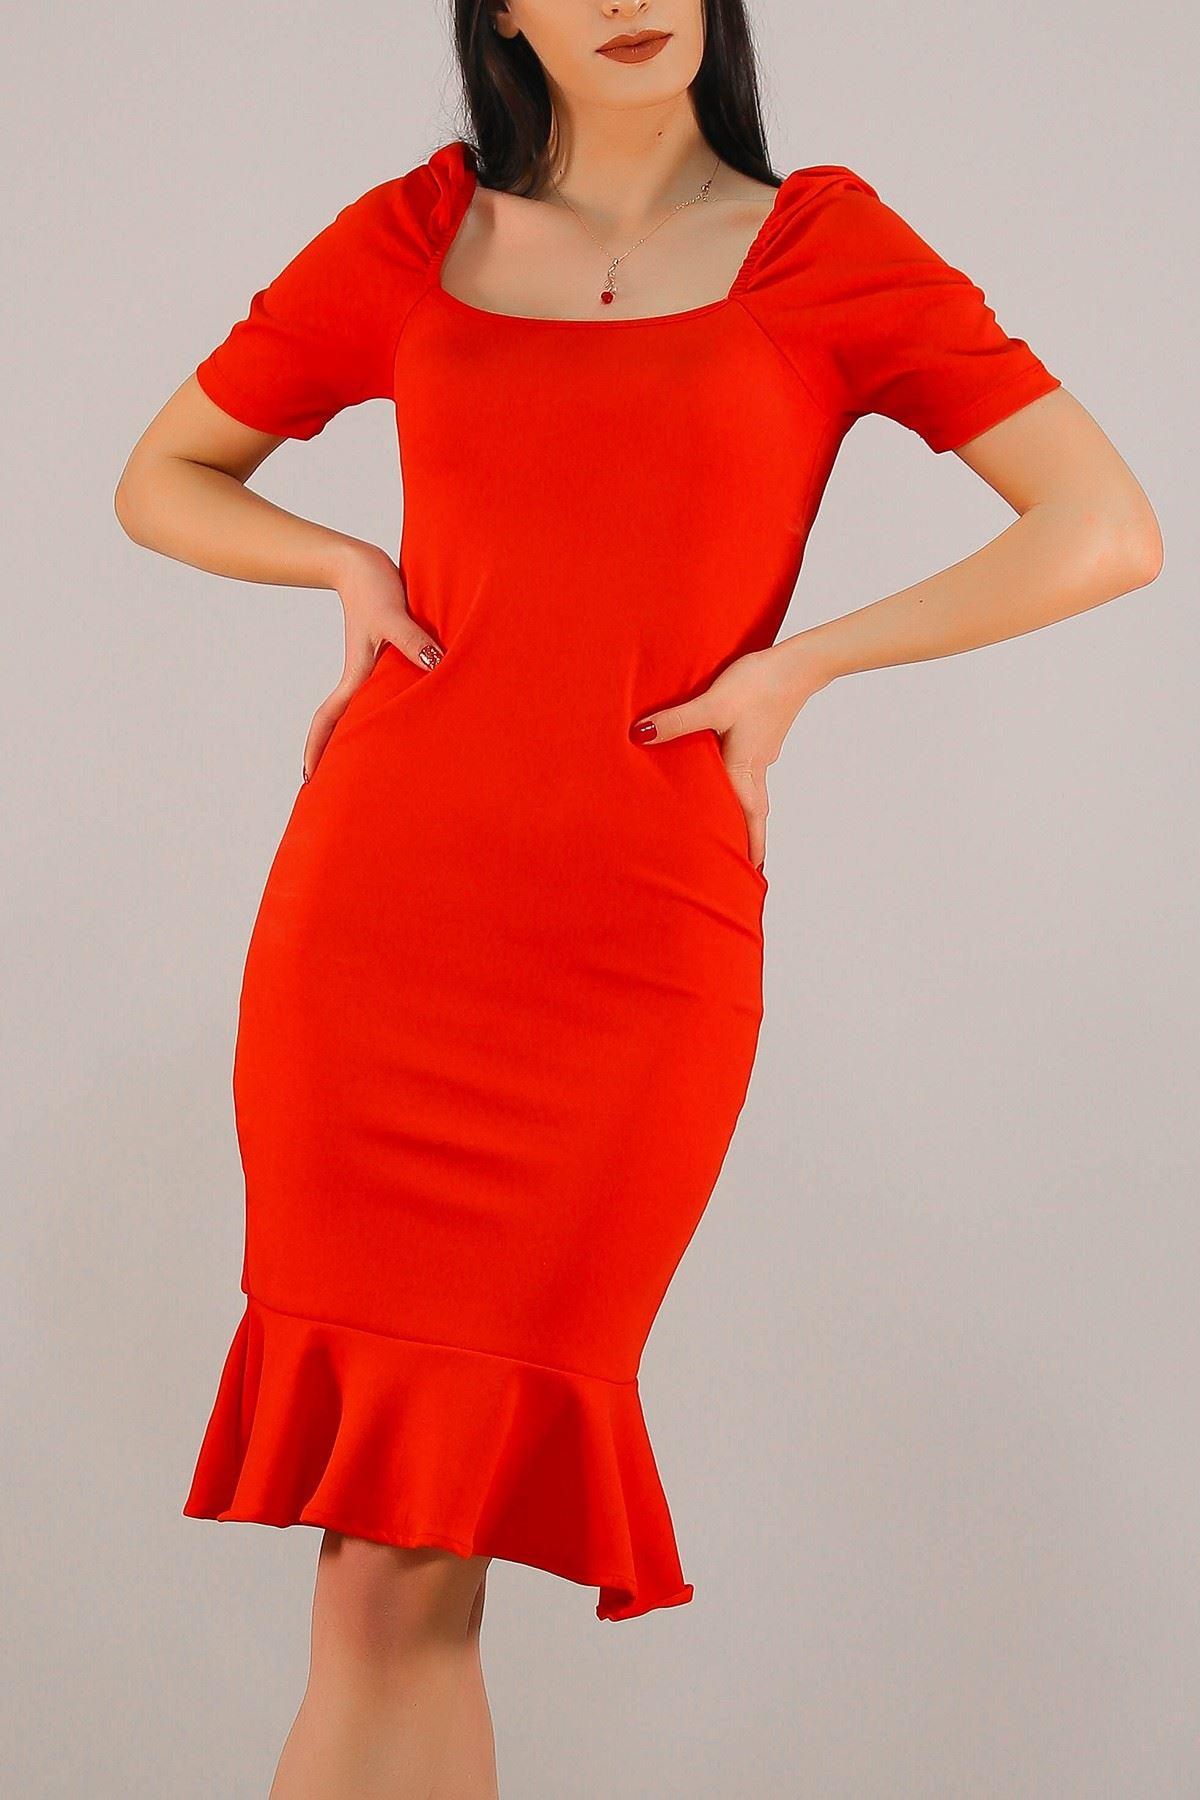 Prenses Kol Elbise Kırmızı - 5198.994.